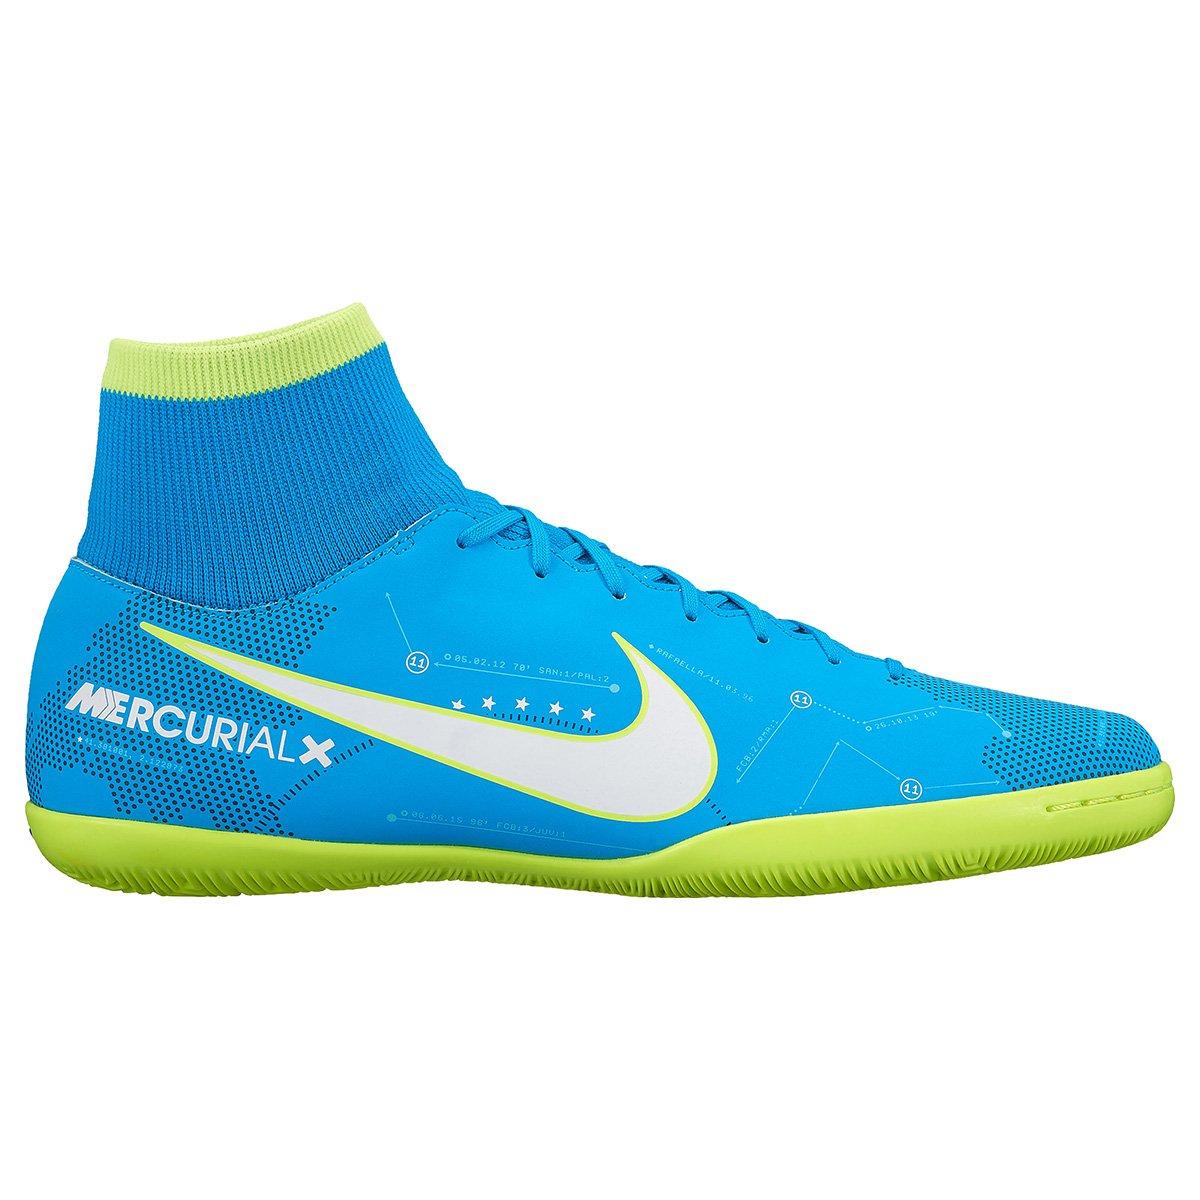 ... australia o produto chuteira futsal nike mercurial victory 6 df neymar  jr ic masculina azul e ... 825459ac70680